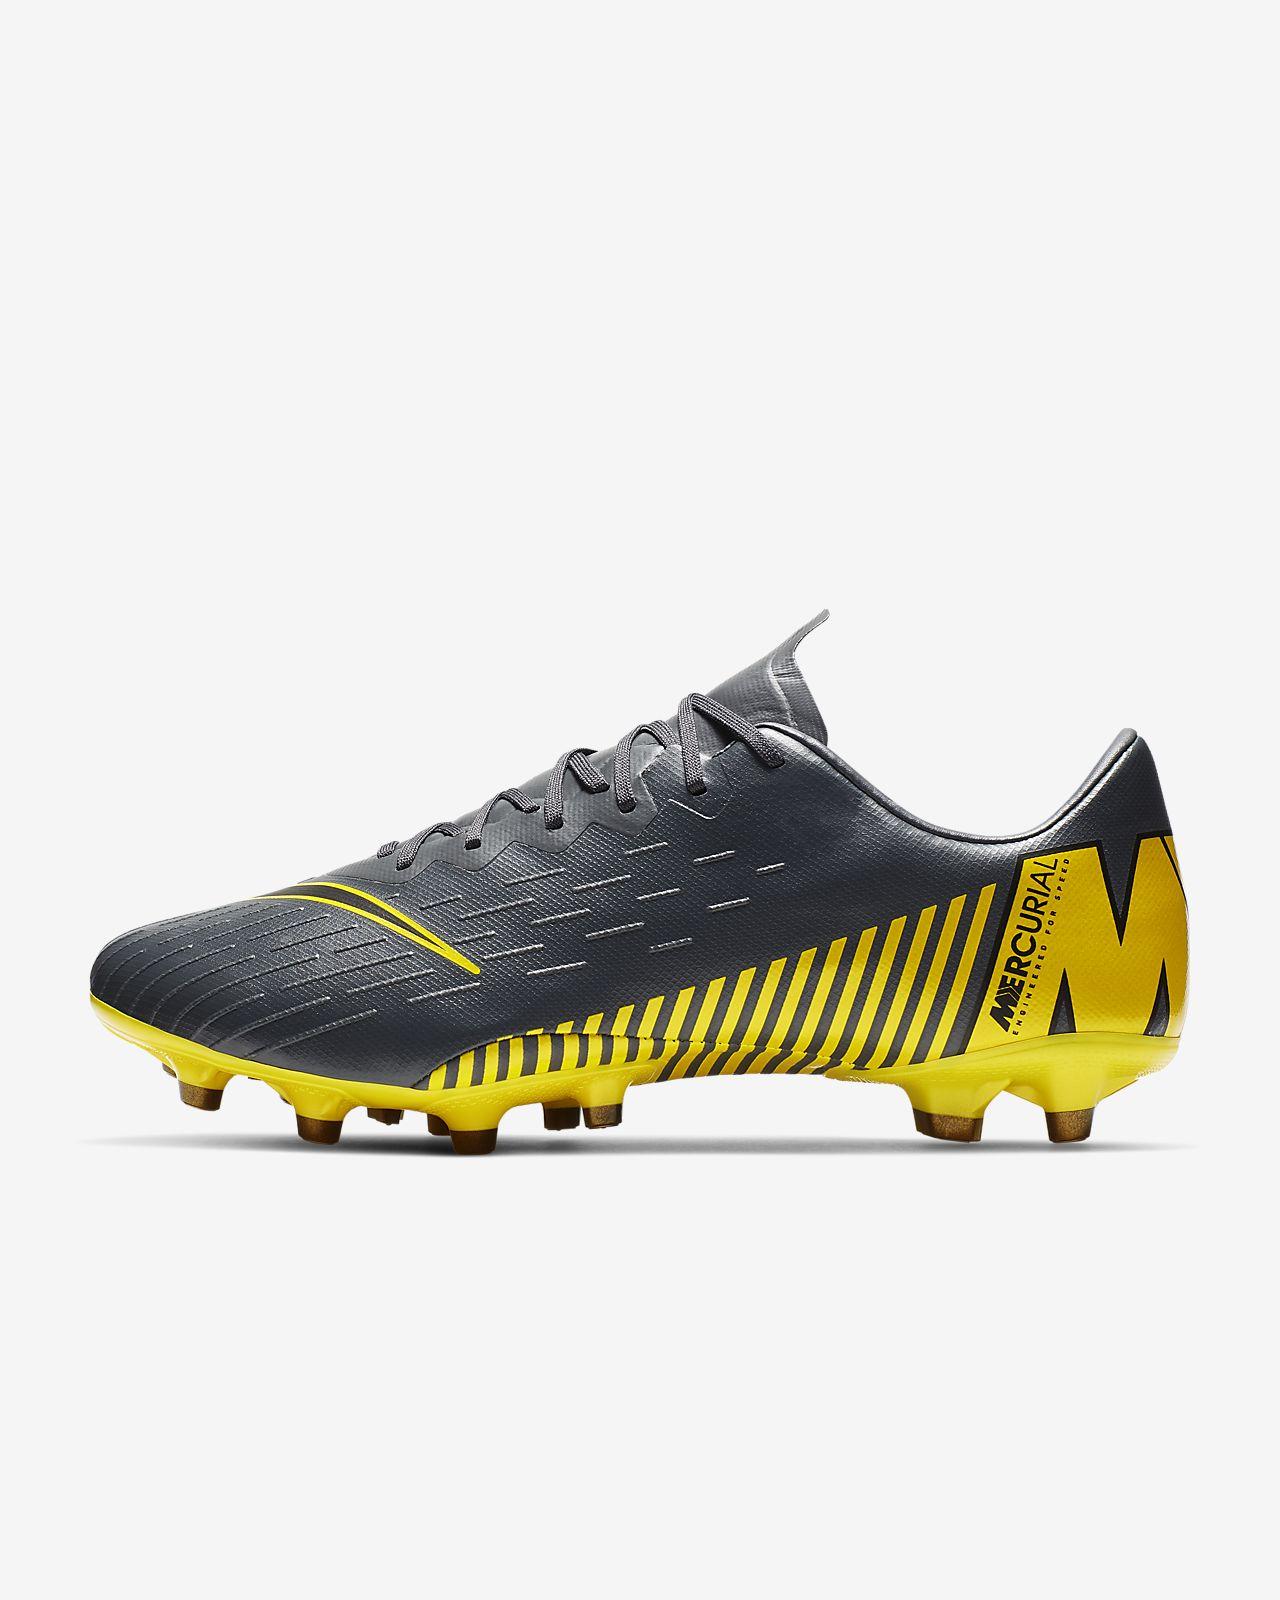 Nike Mercurial Vapor XII Pro AG-PRO Botes de futbol per a gespa artificial